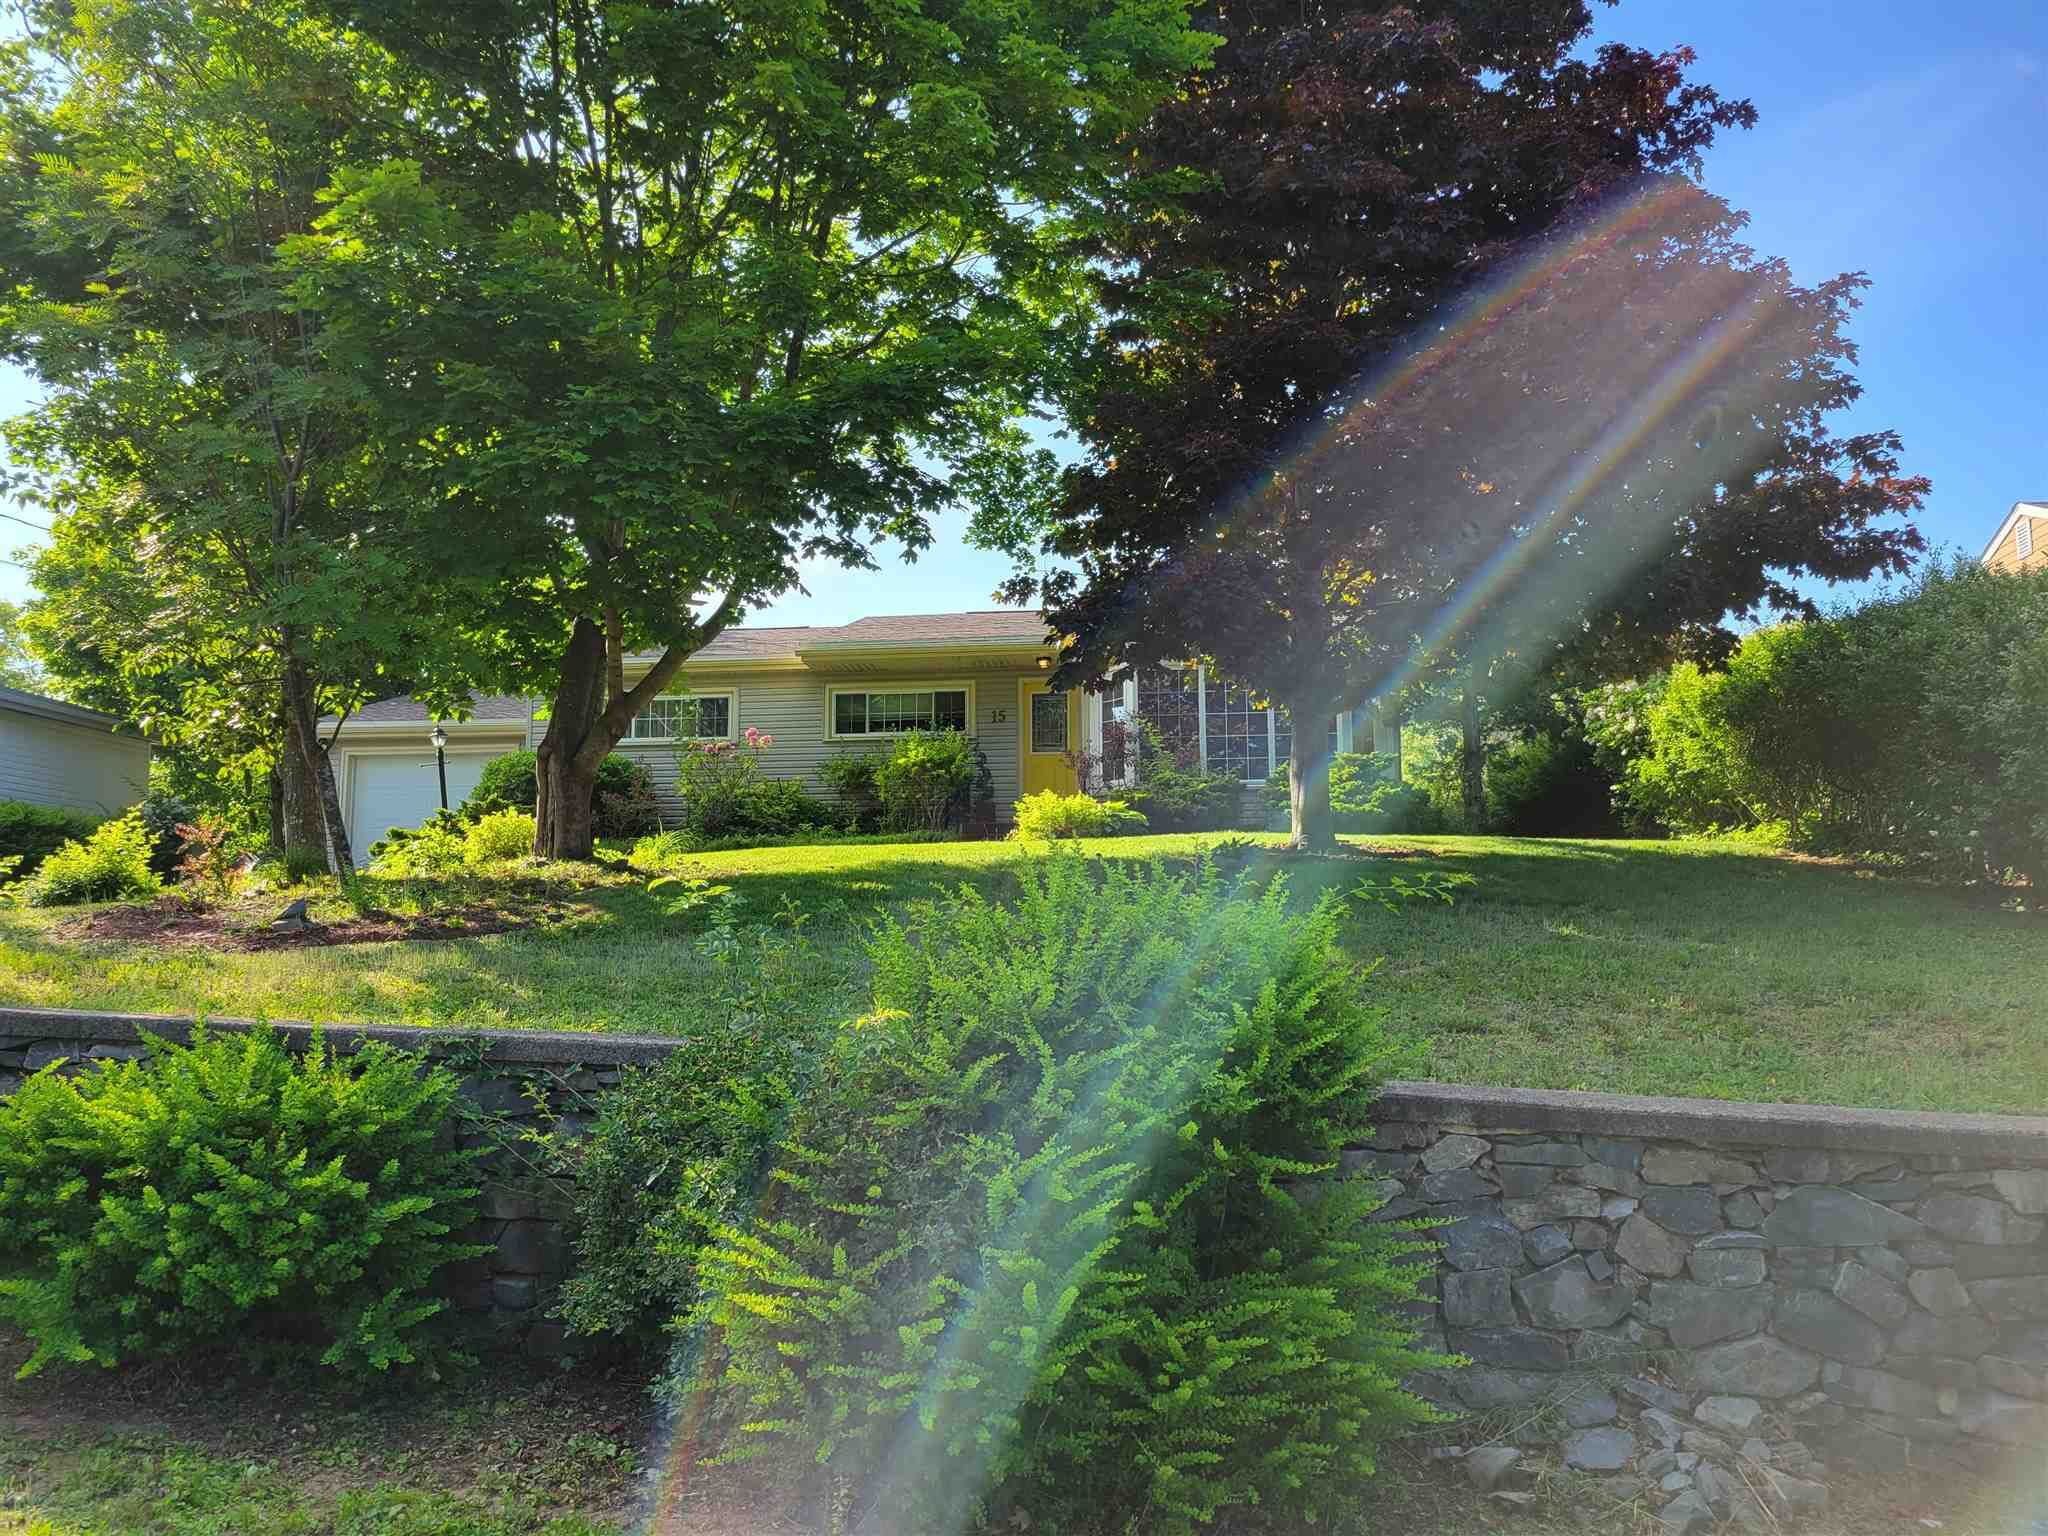 Main Photo: 15 Lynwood Drive in Rockingham: 5-Fairmount, Clayton Park, Rockingham Residential for sale (Halifax-Dartmouth)  : MLS®# 202117785